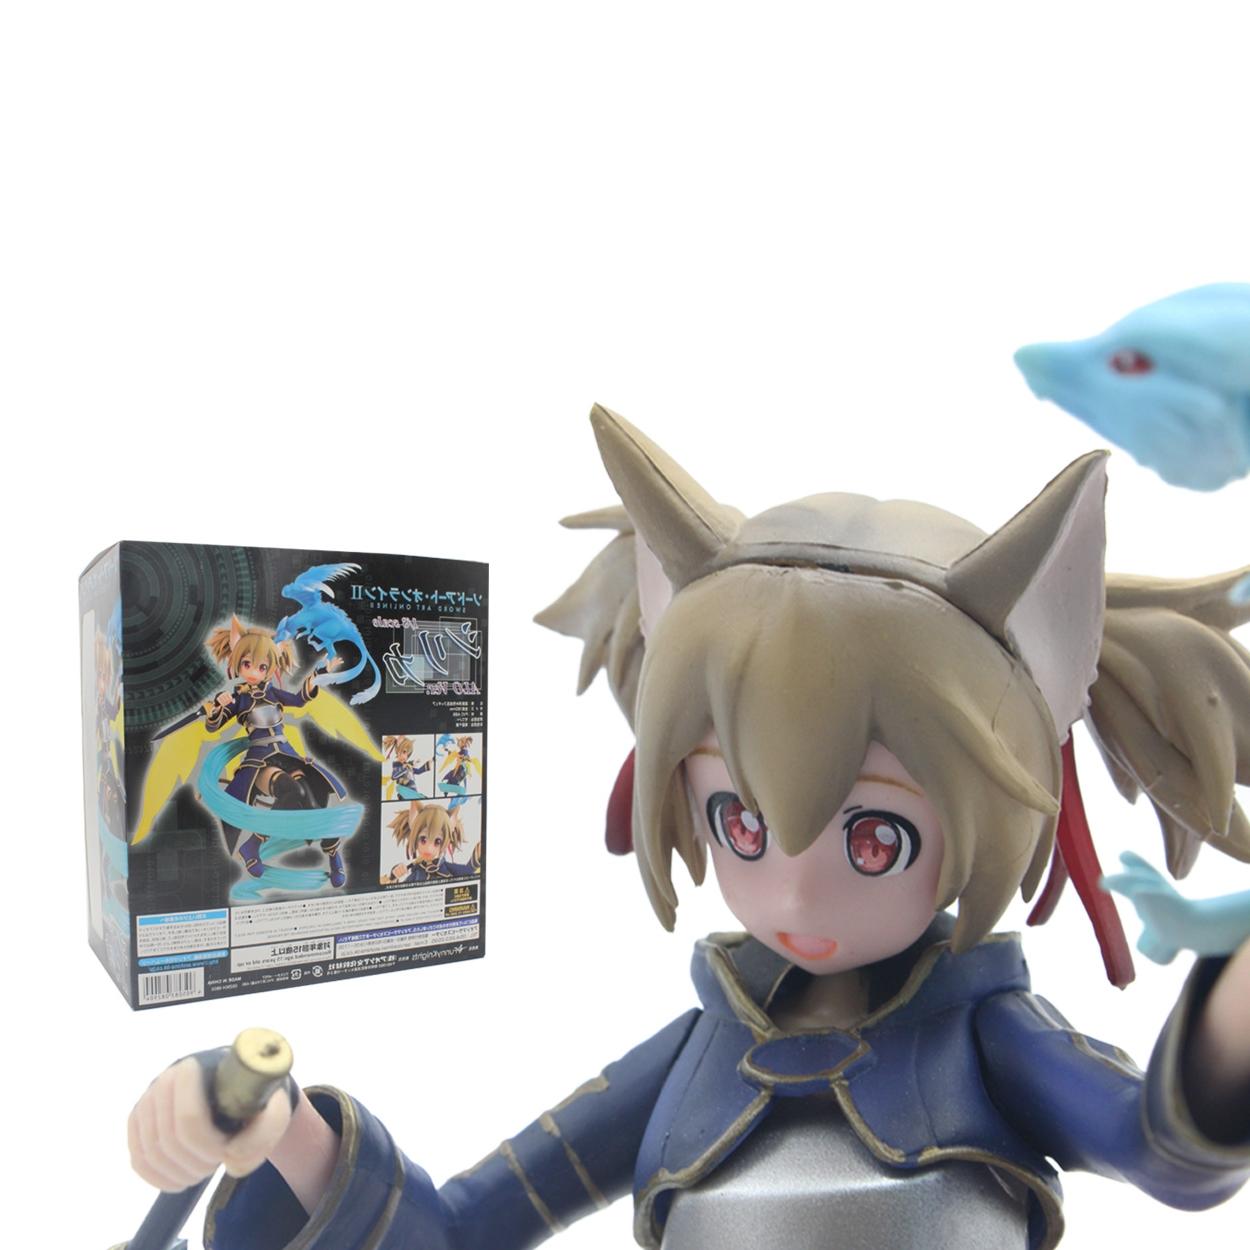 31.00$  Buy now - https://alitems.com/g/1e8d114494b01f4c715516525dc3e8/?i=5&ulp=https%3A%2F%2Fwww.aliexpress.com%2Fitem%2FSword-Art-Online-Sailica-1pcs-set-20cm-PVC-SAO-Action-Anime-Figure-Model-Doll-Collection-Kids%2F32637926485.html - Sword Art Online Sailica 1pcs/set 20cm PVC SAO Action Anime Figure Model Doll Collection Kids Gifts Toys 1272 31.00$